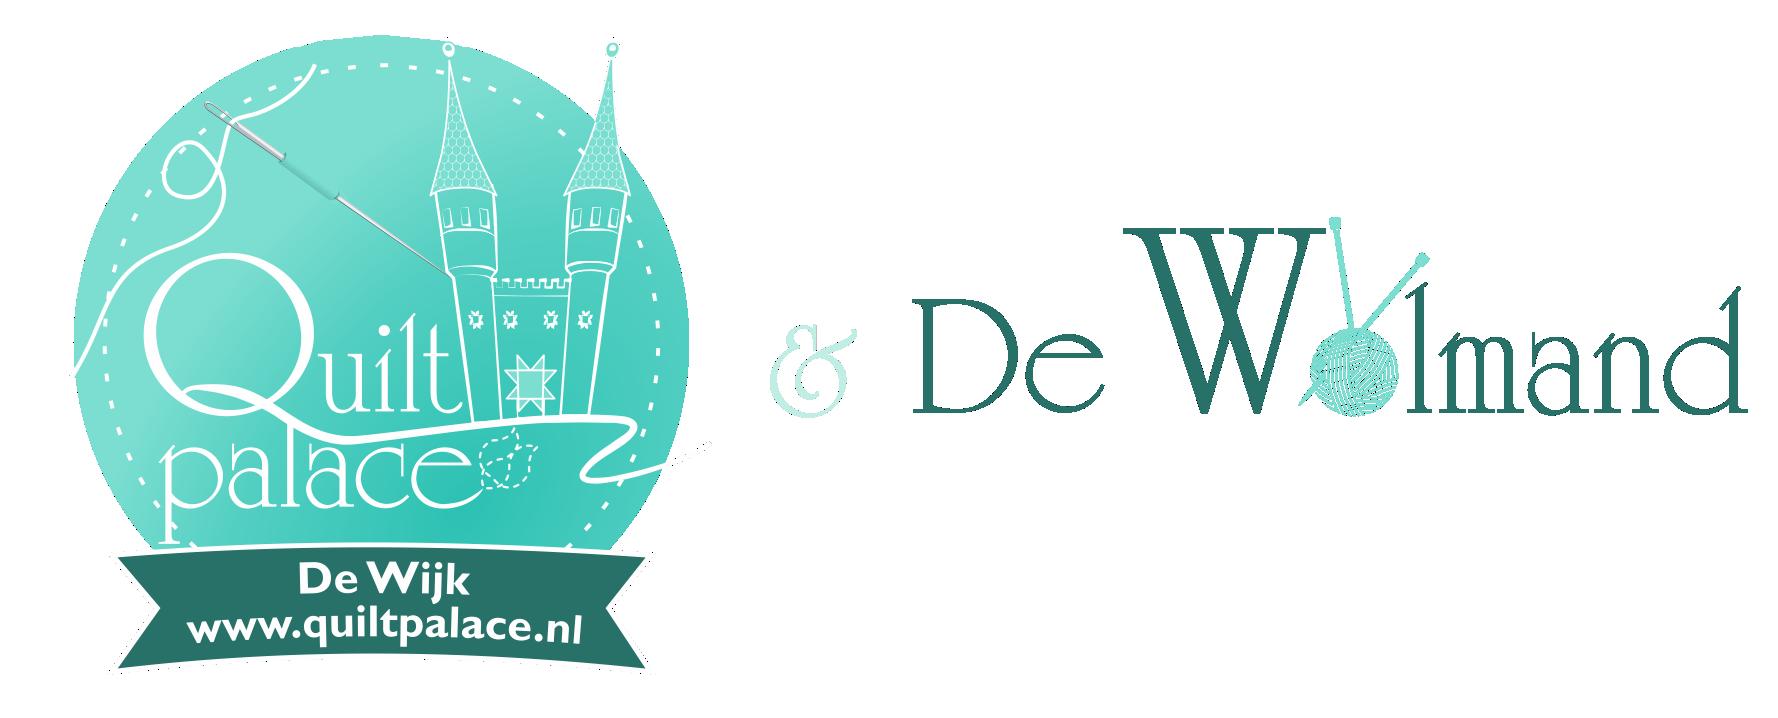 Quiltpalace & De Wolmand